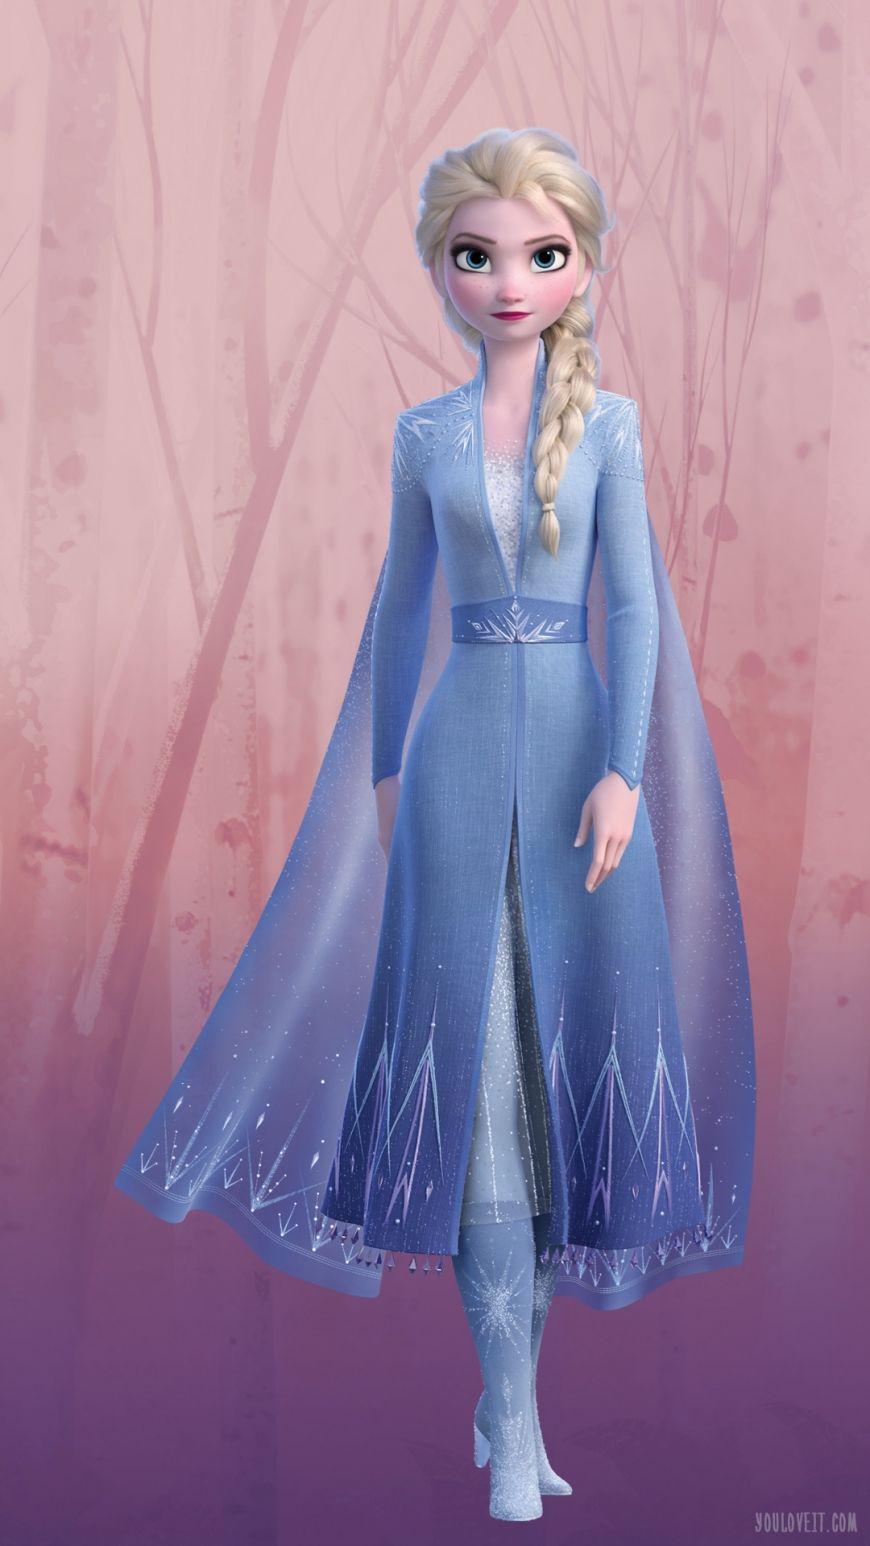 Frozen 2 Elsa Phone Wallpaper Disney Princess Elsa Disney Princess Frozen Frozen Disney Movie